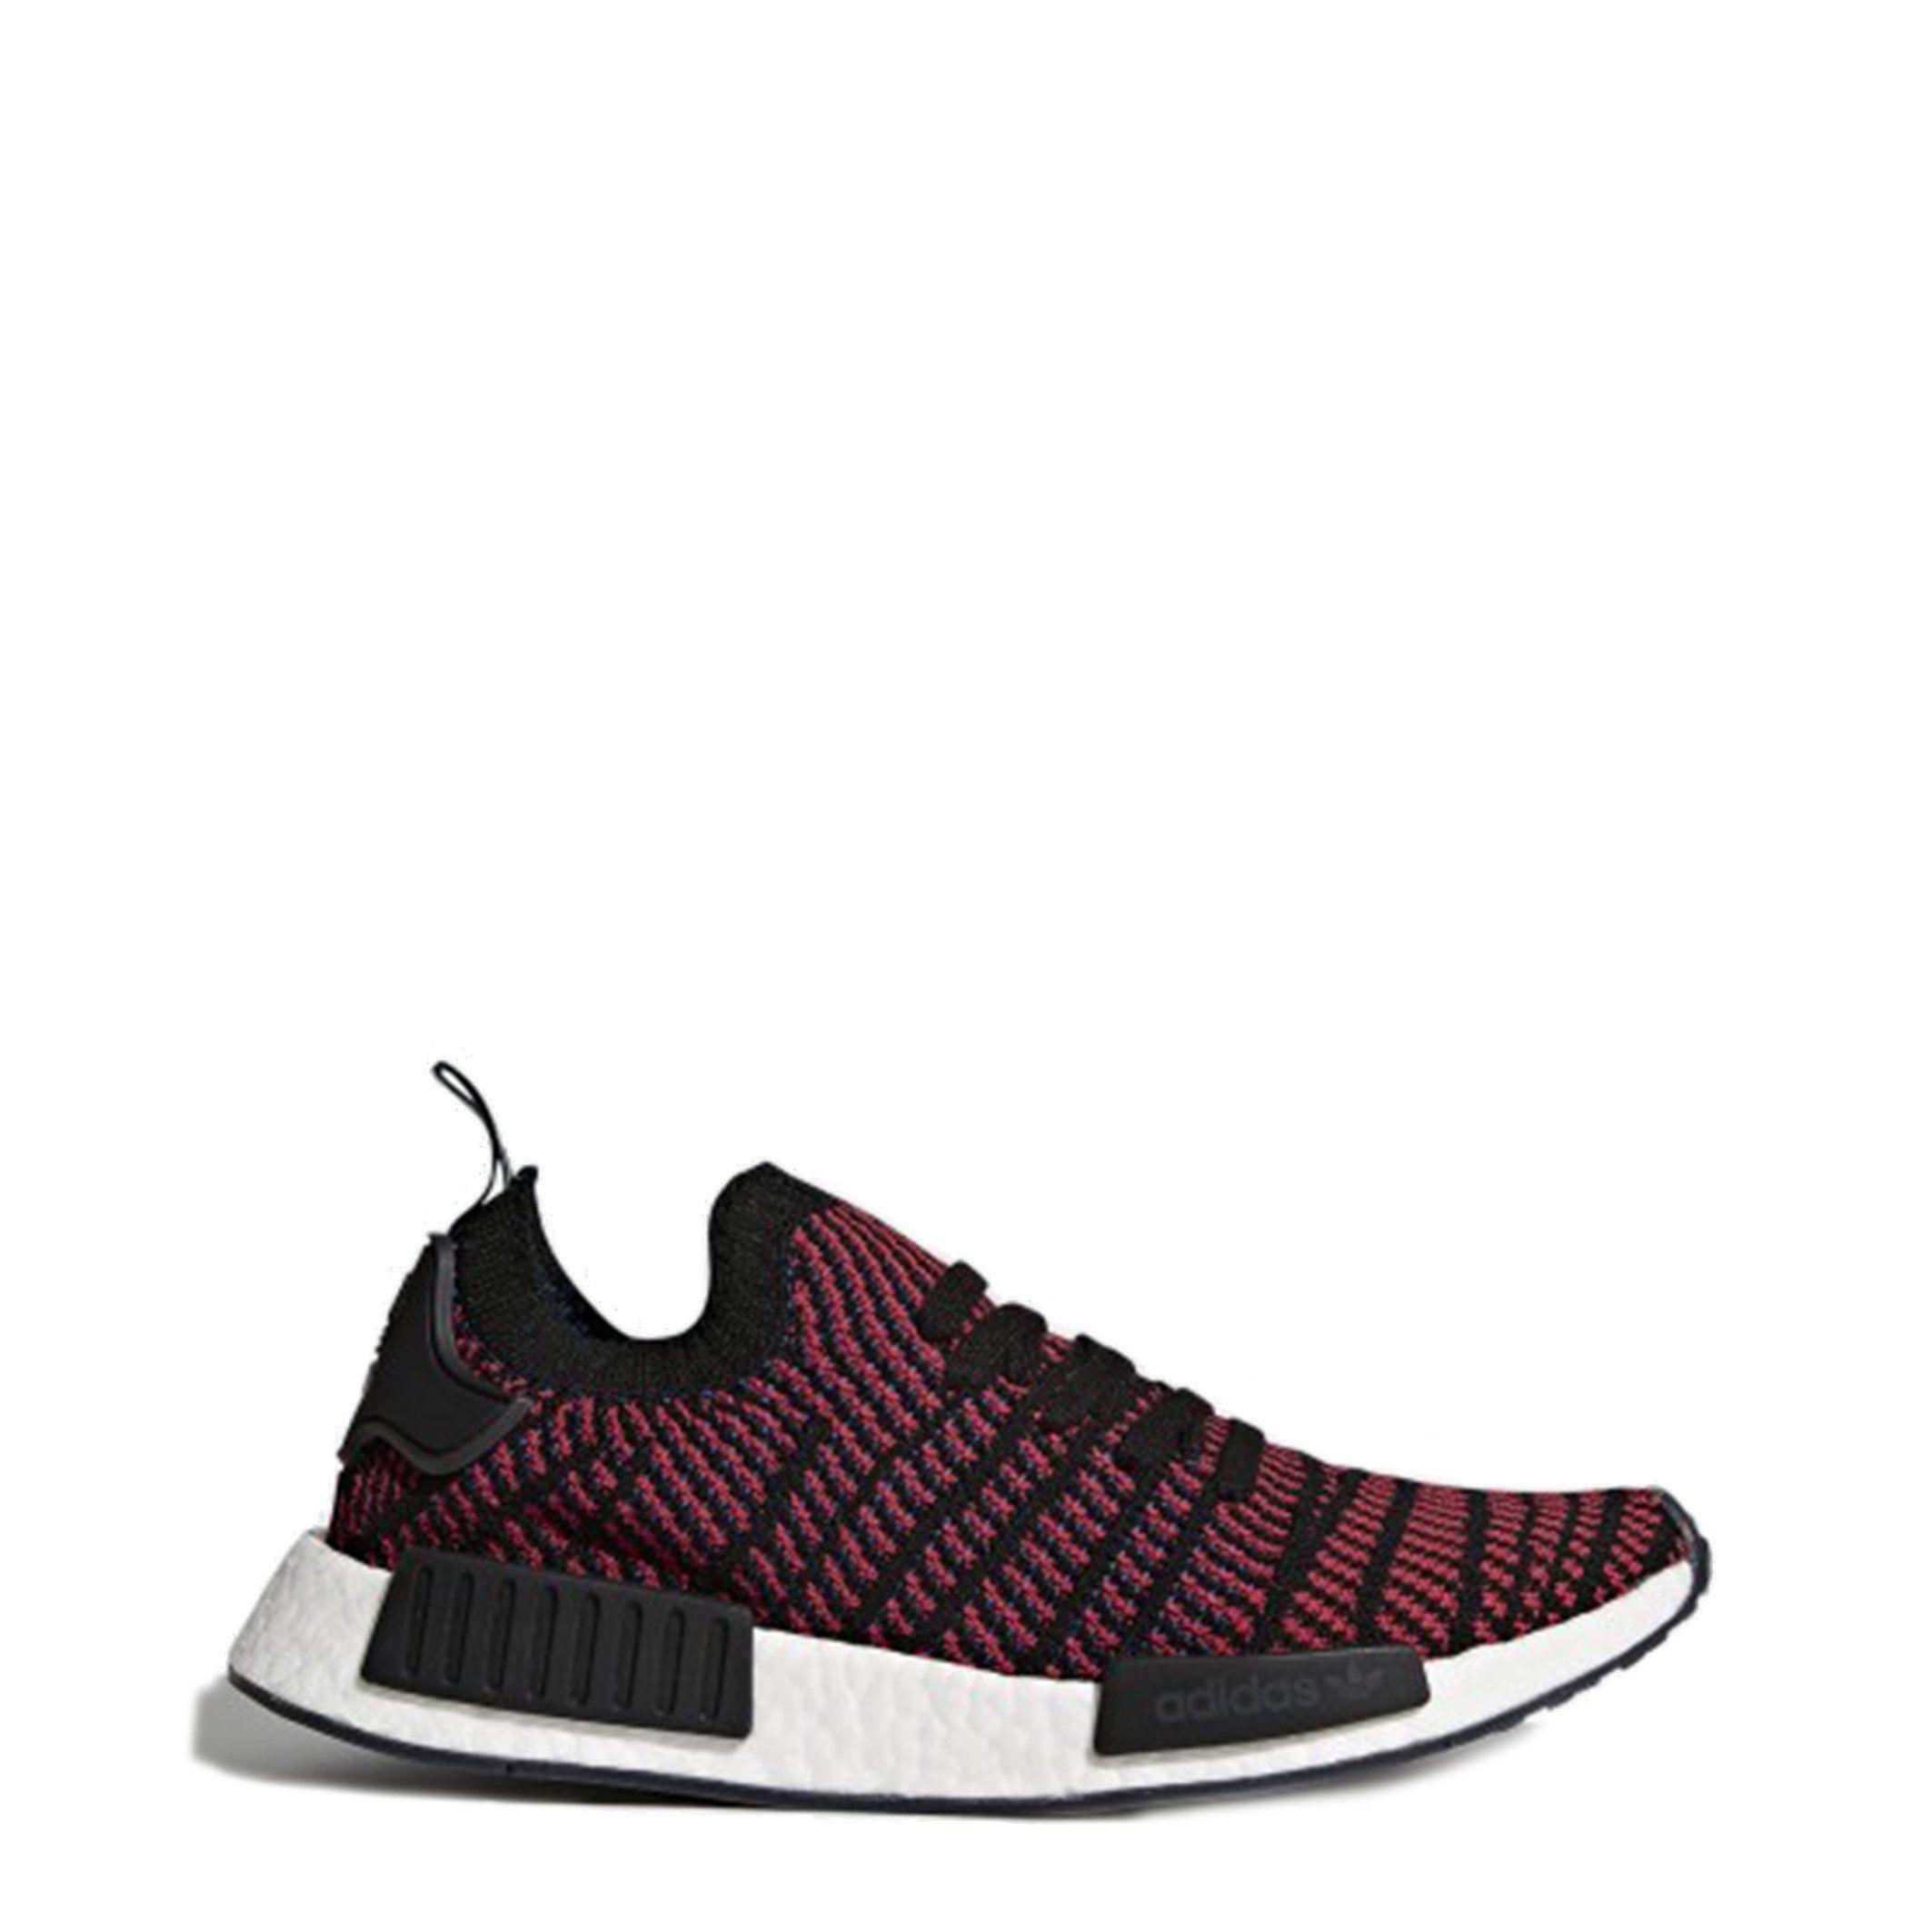 d0418aed039c1 Adidas NMD R1 Men s Progressive EVA Red White Black Stripe Running Shoes